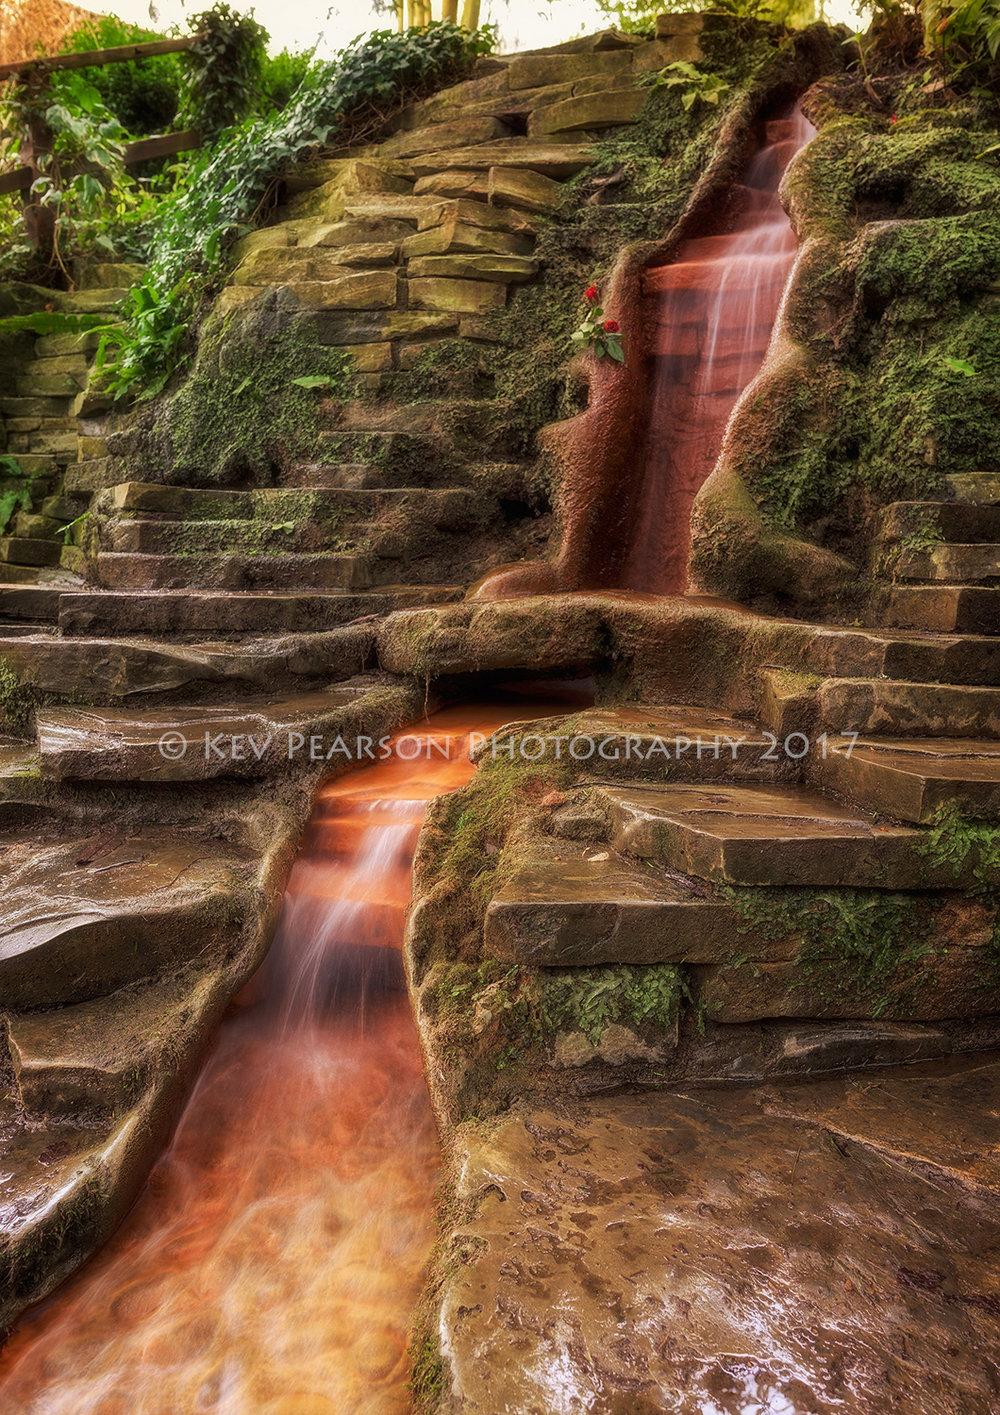 King Arthur's Waterfall -